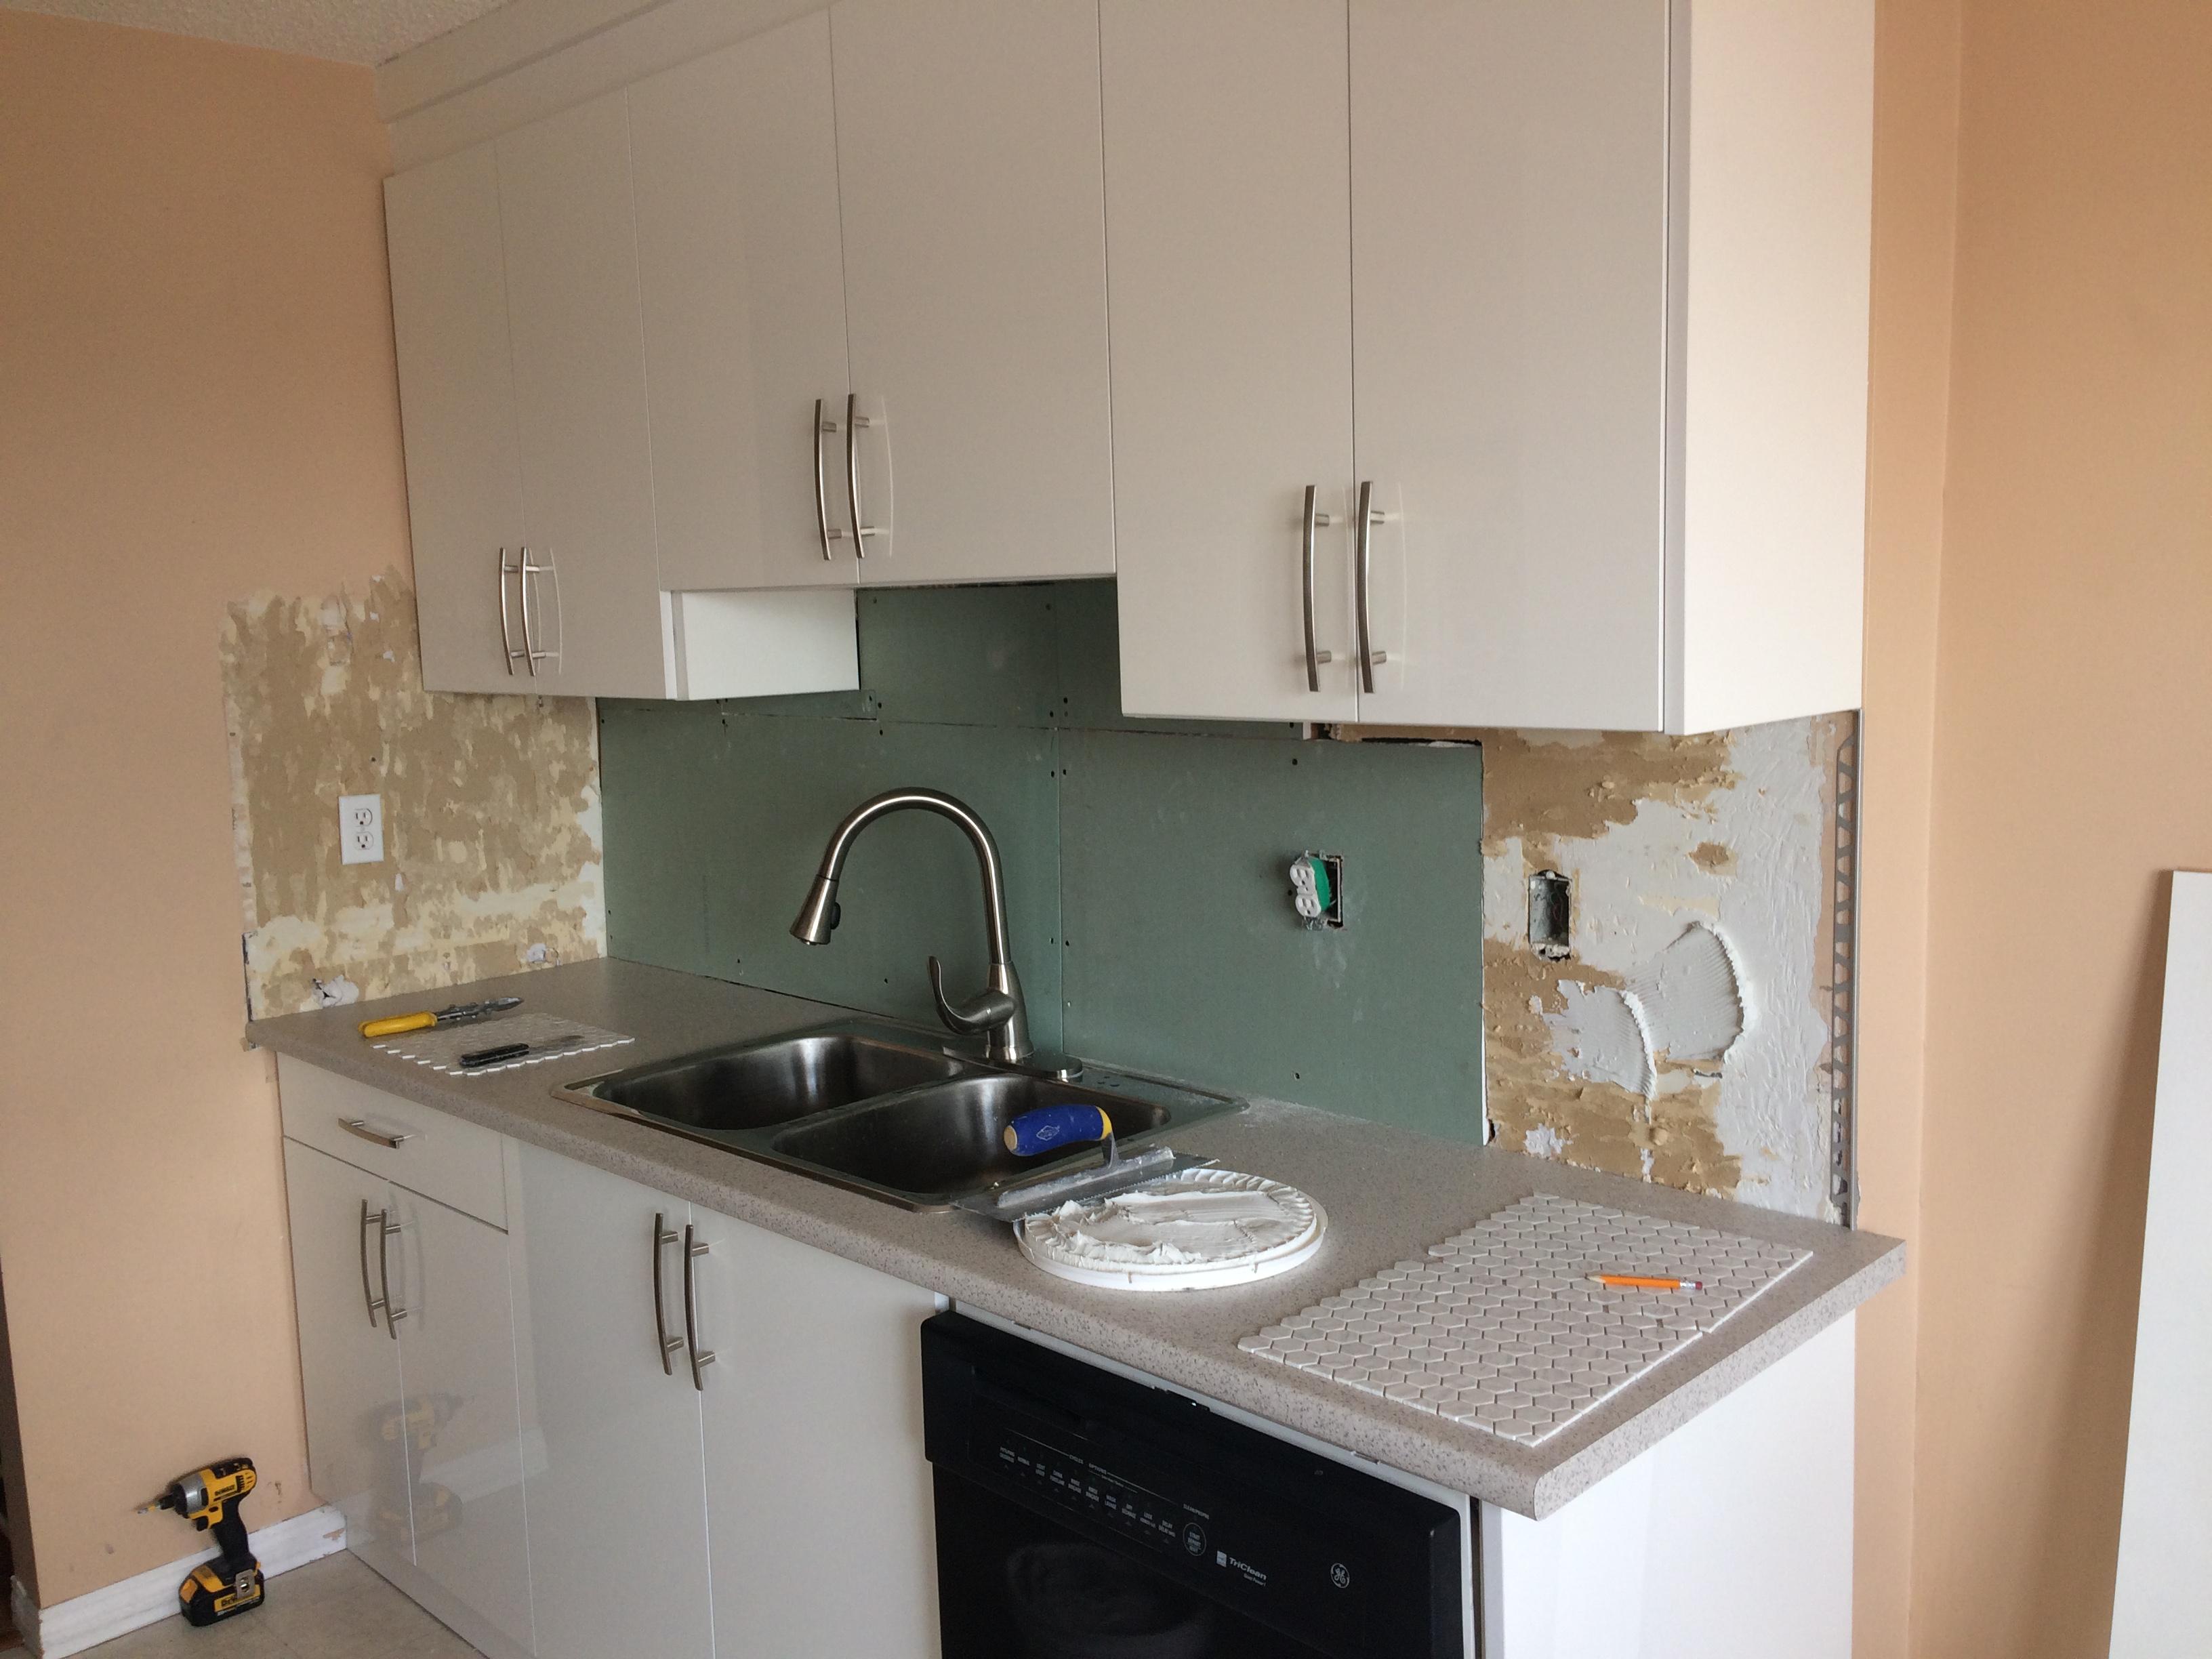 Kitchen splash replacement (during)